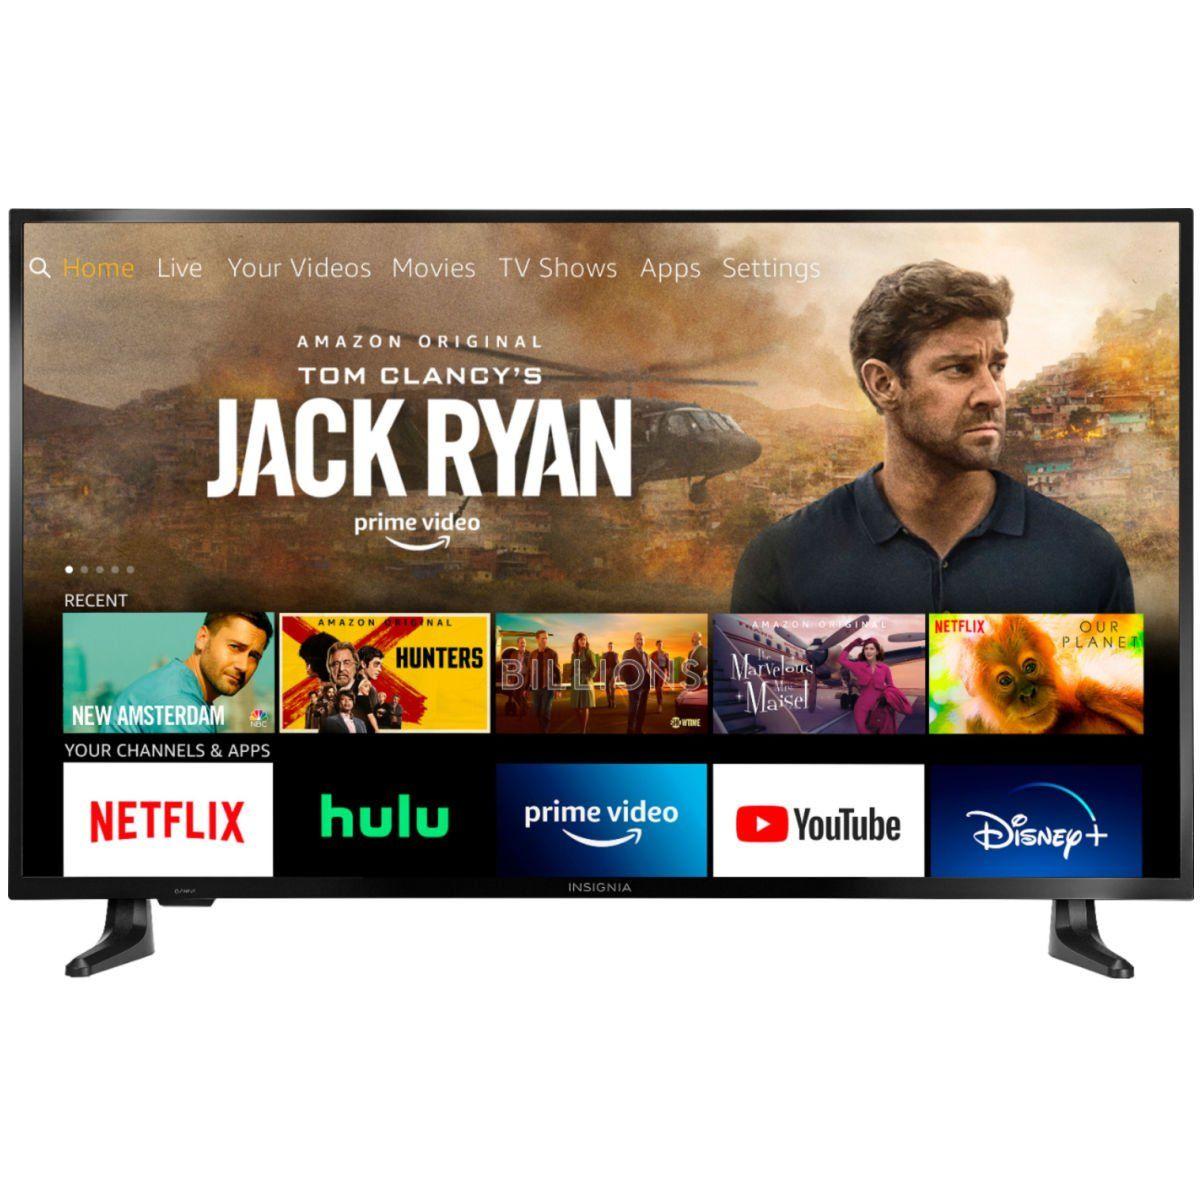 Insignia Ns 43df710na21 43 Inch Led 4k Ultra Smart Hdtv In 2021 Fire Tv Tv Deals Tv